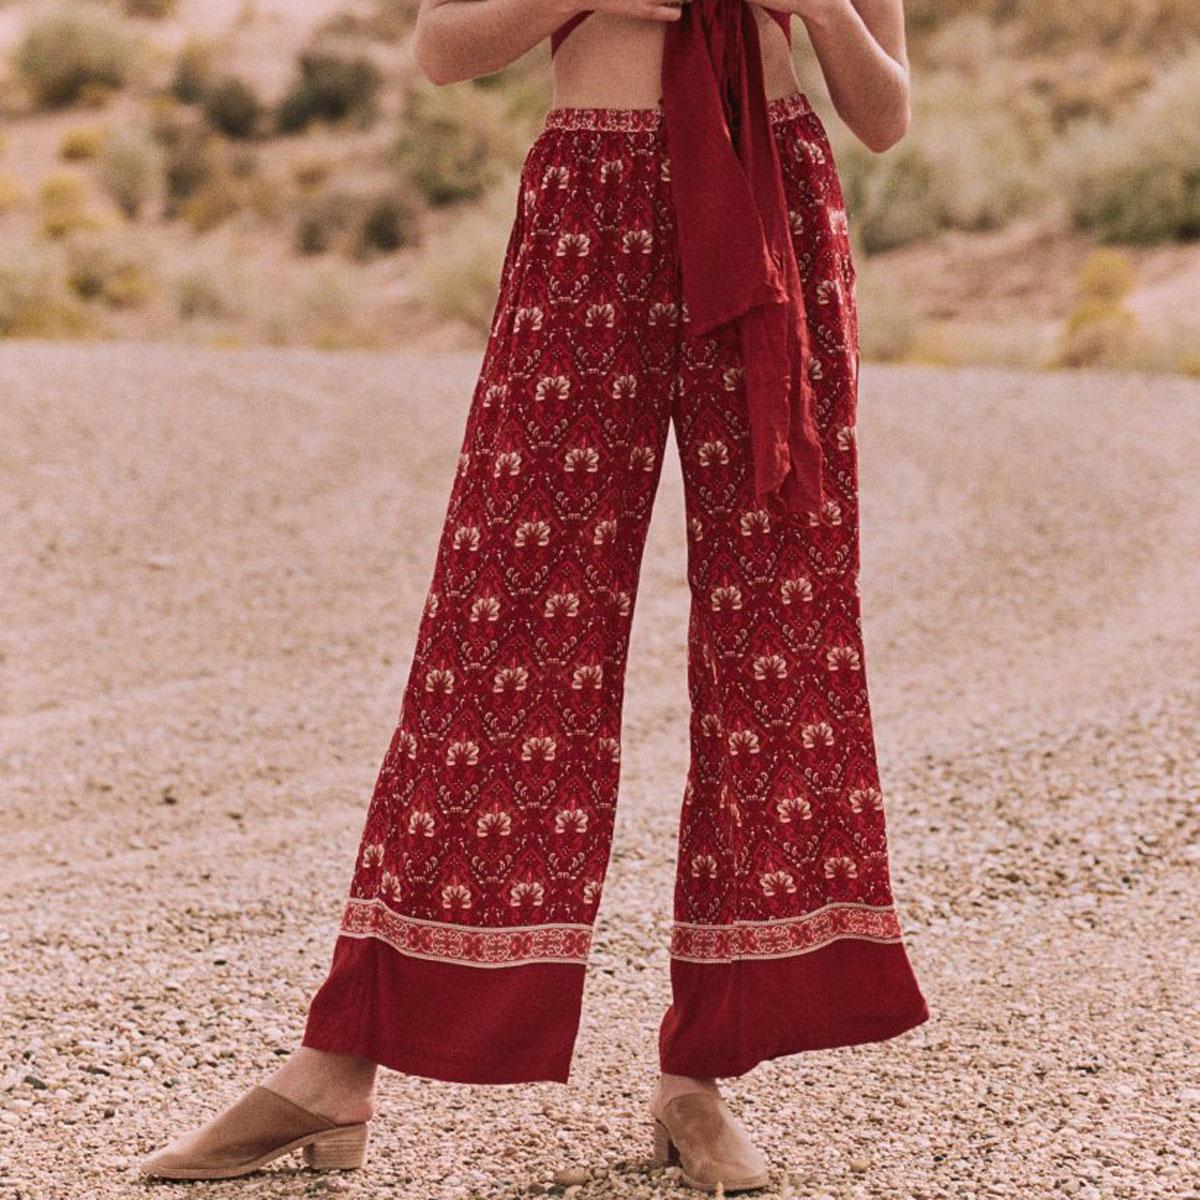 2018 Summer Oversize Print Pants 2018 Summer Red High Waist Trousers Women Pant Boho Hippie Casual Wide Leg Pants Capris Female